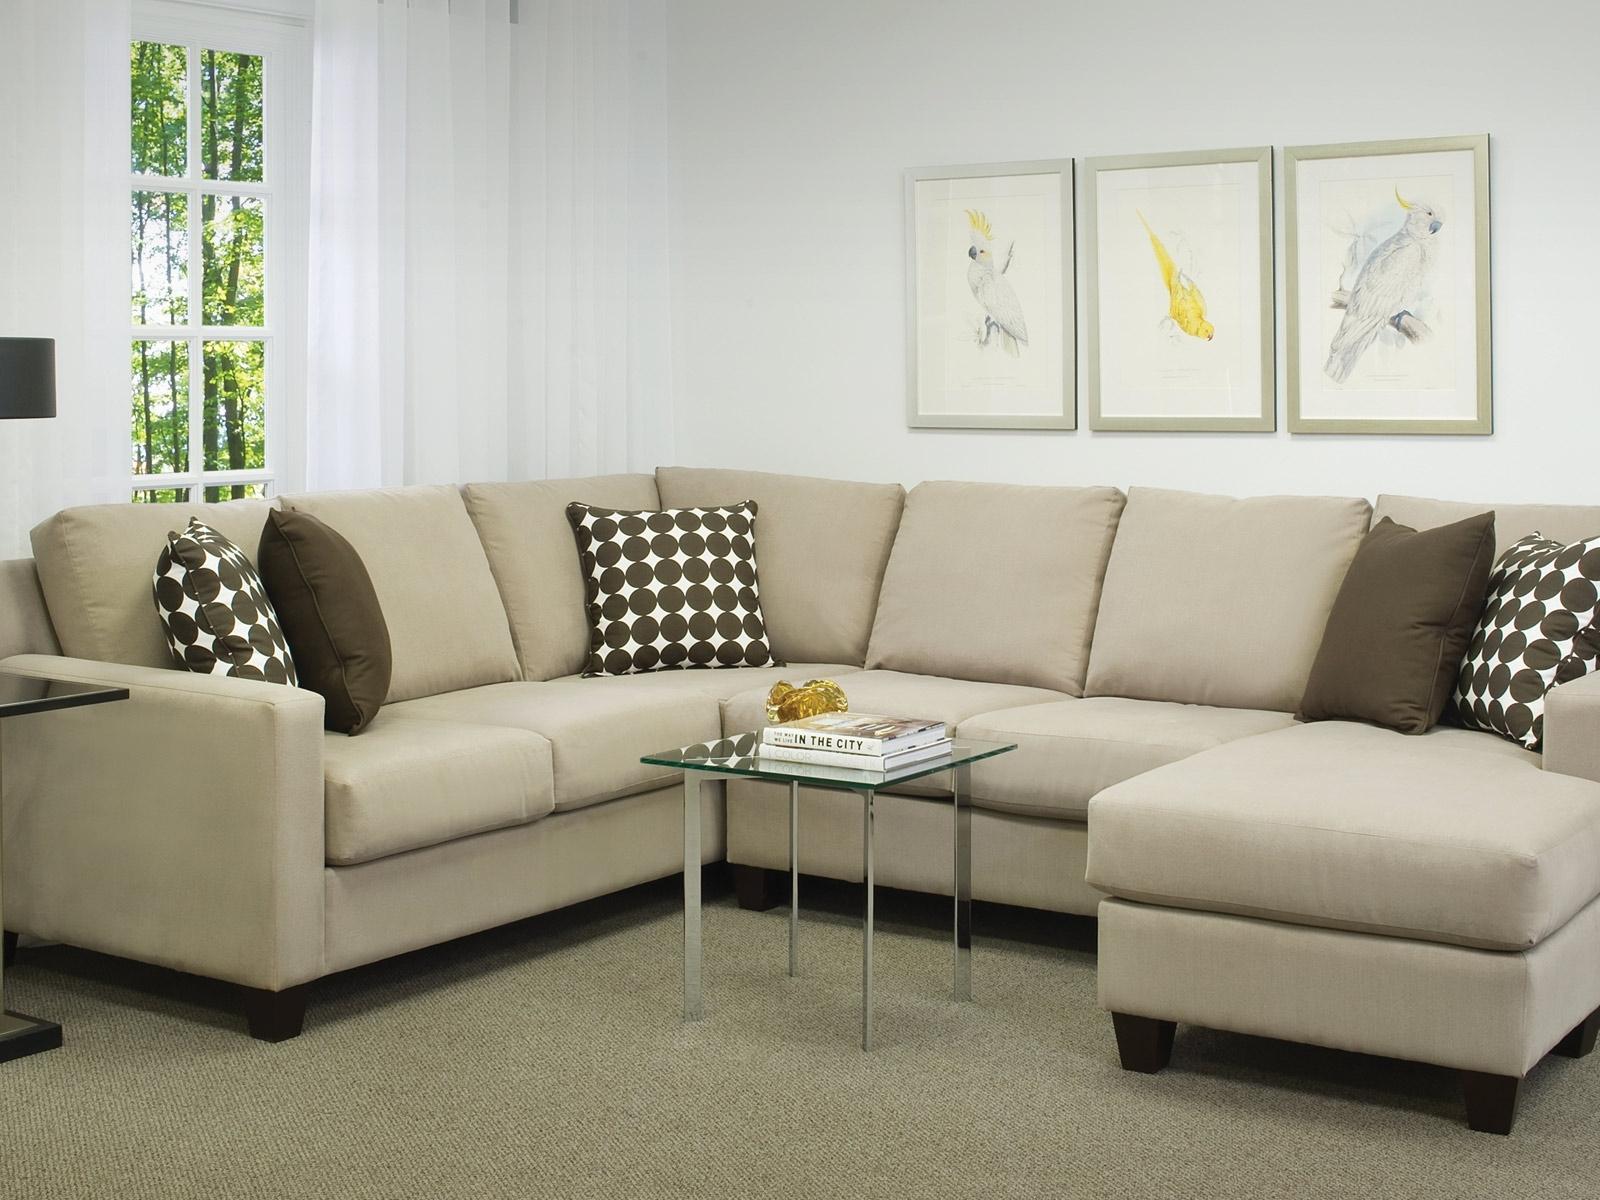 Collections – Manorhouse Furniture – Halifax, Nova Scotia Pertaining To Nova Scotia Sectional Sofas (Image 2 of 10)